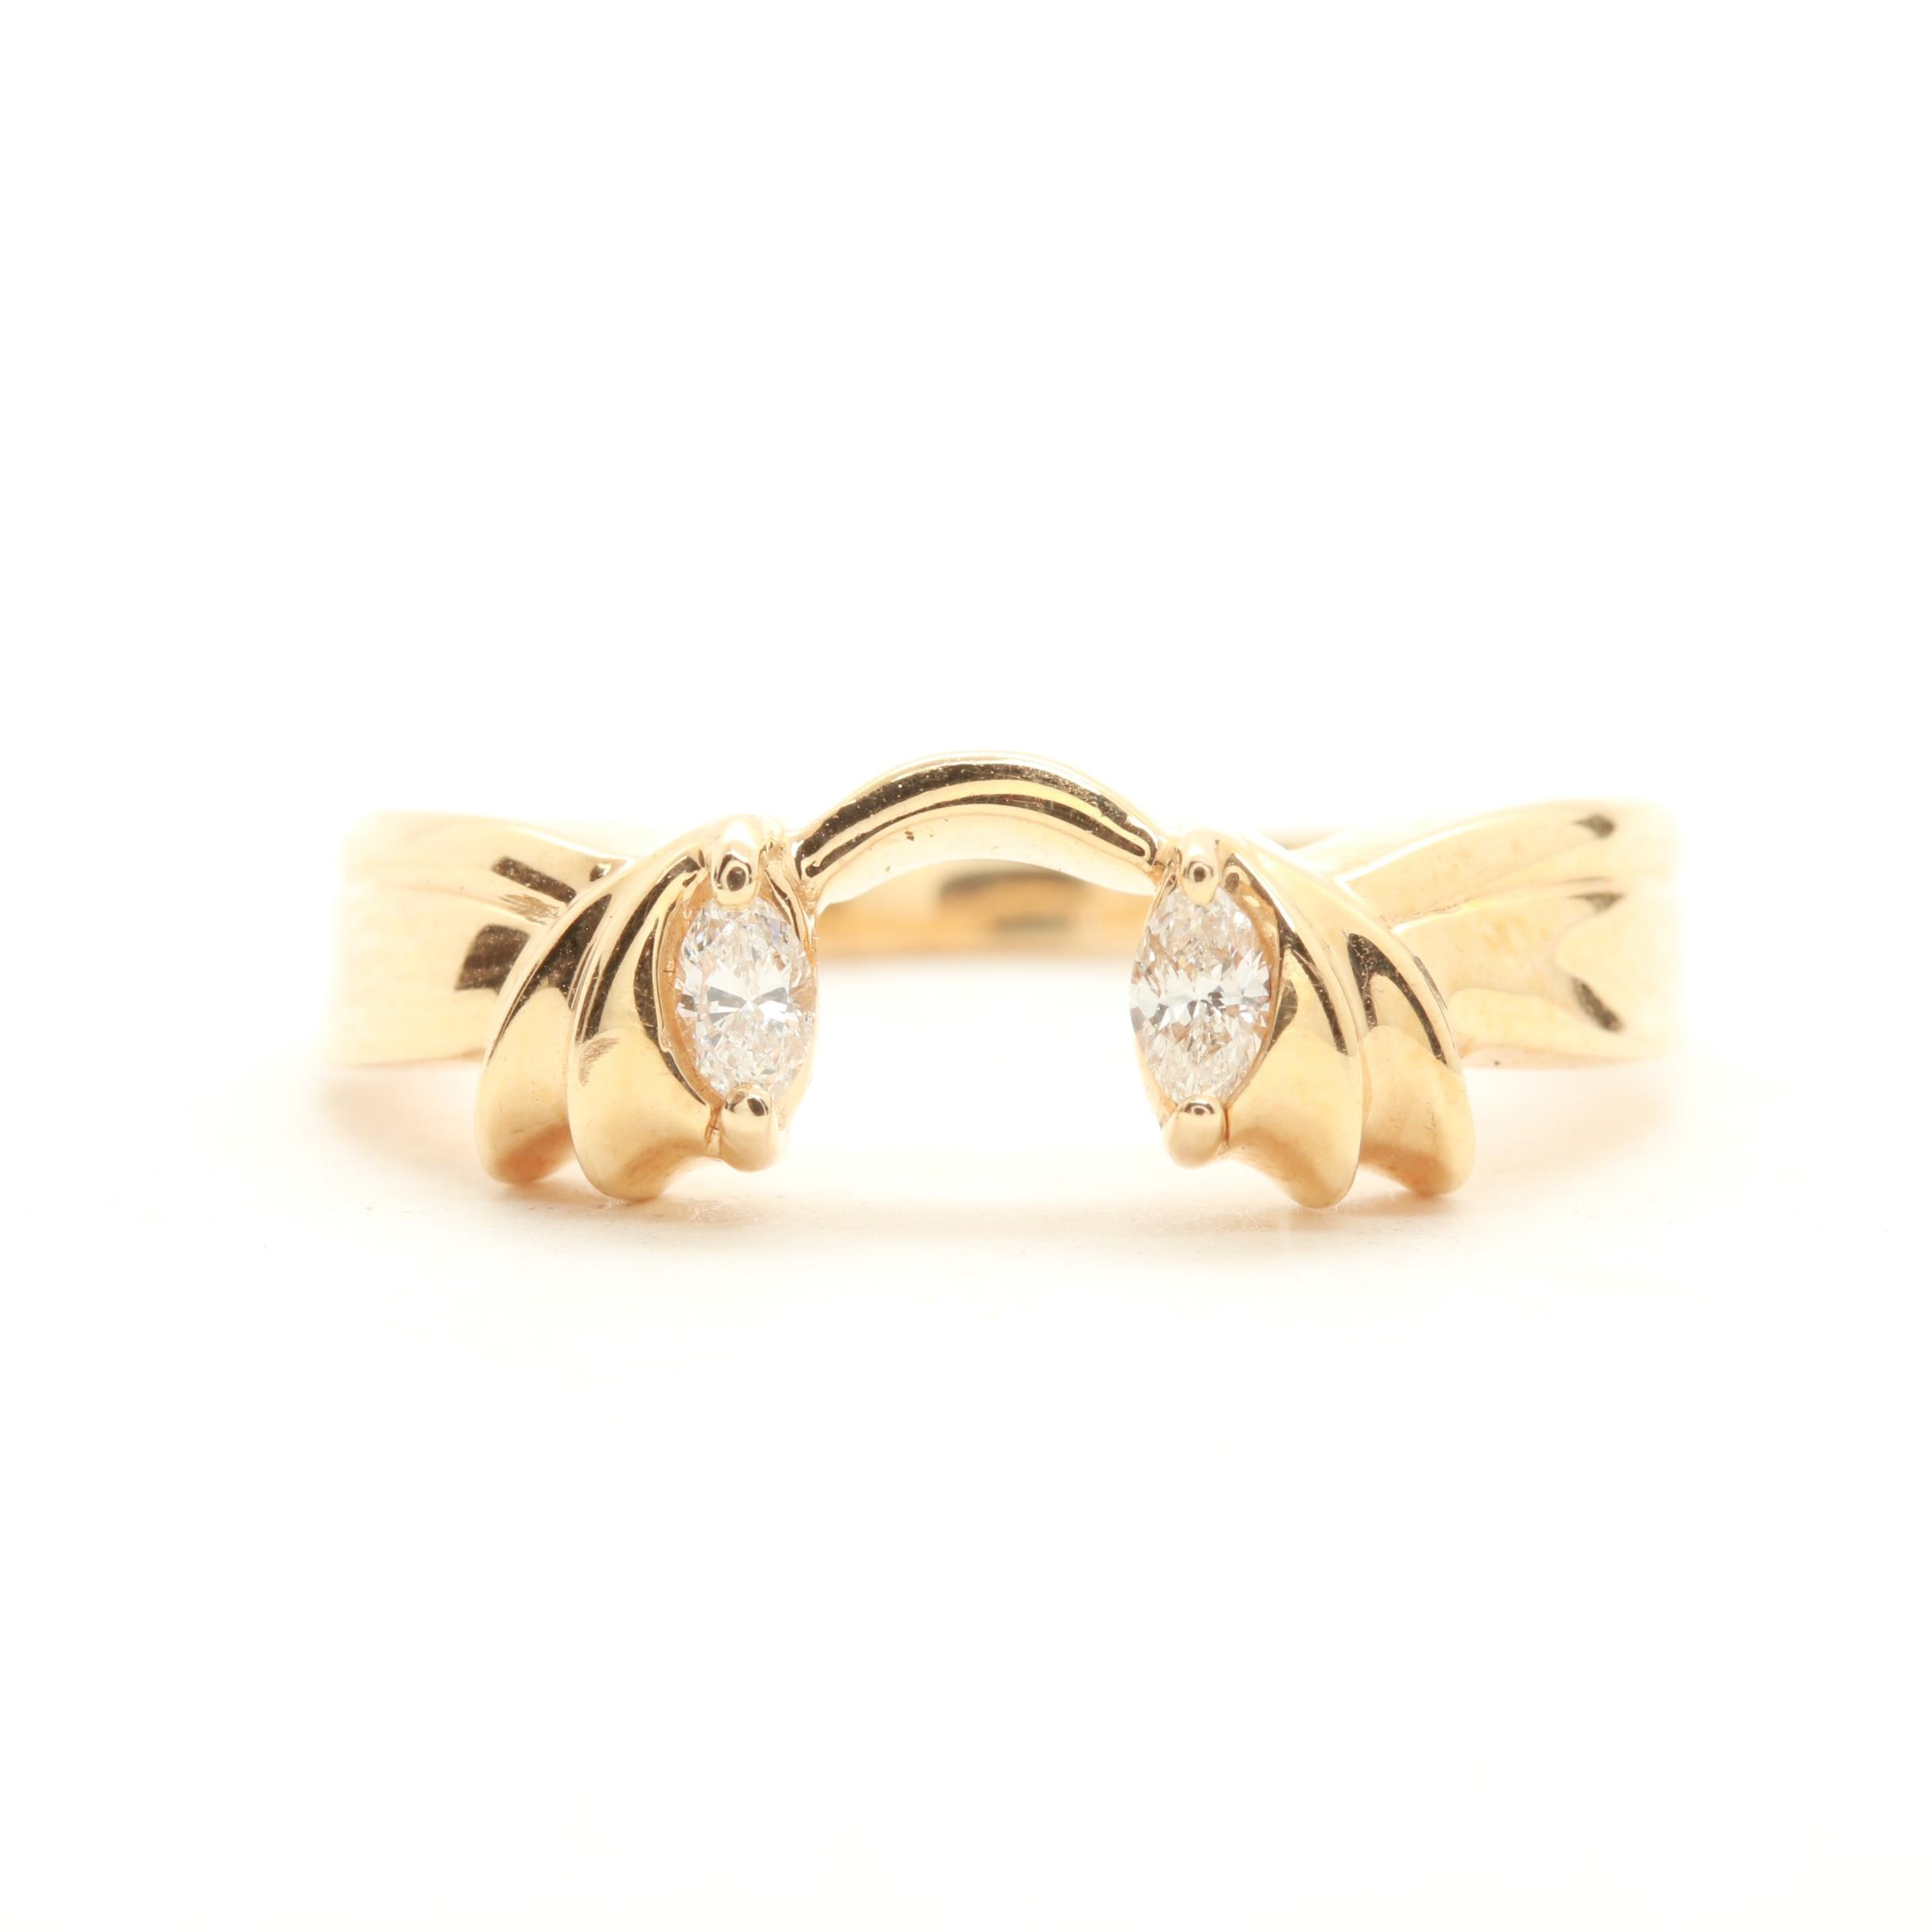 14K Yellow Gold Diamond Nesting Ring